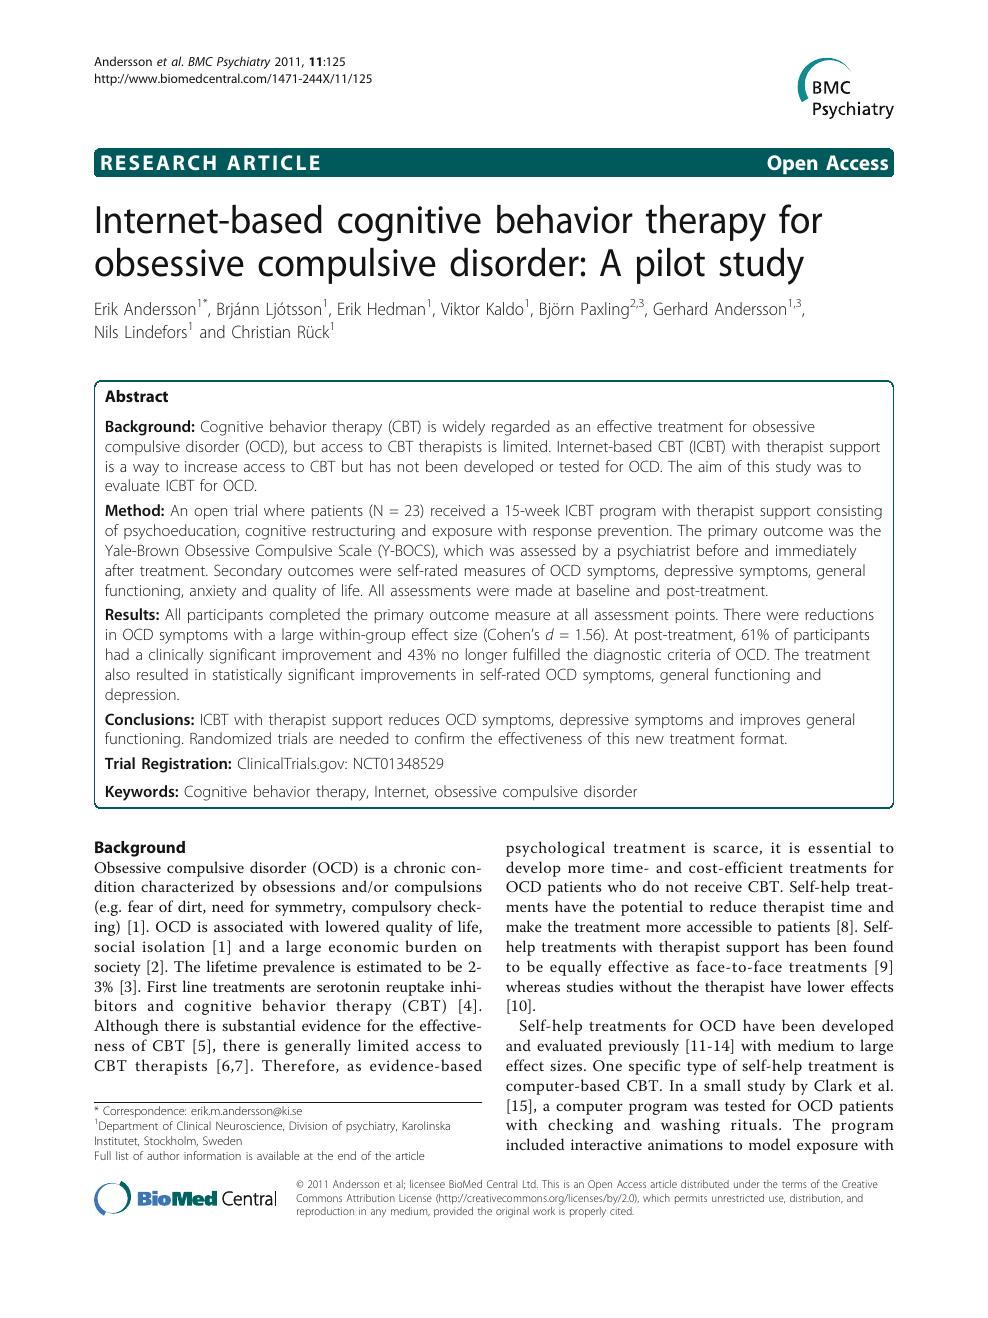 obsessive compulsive disorder research paper